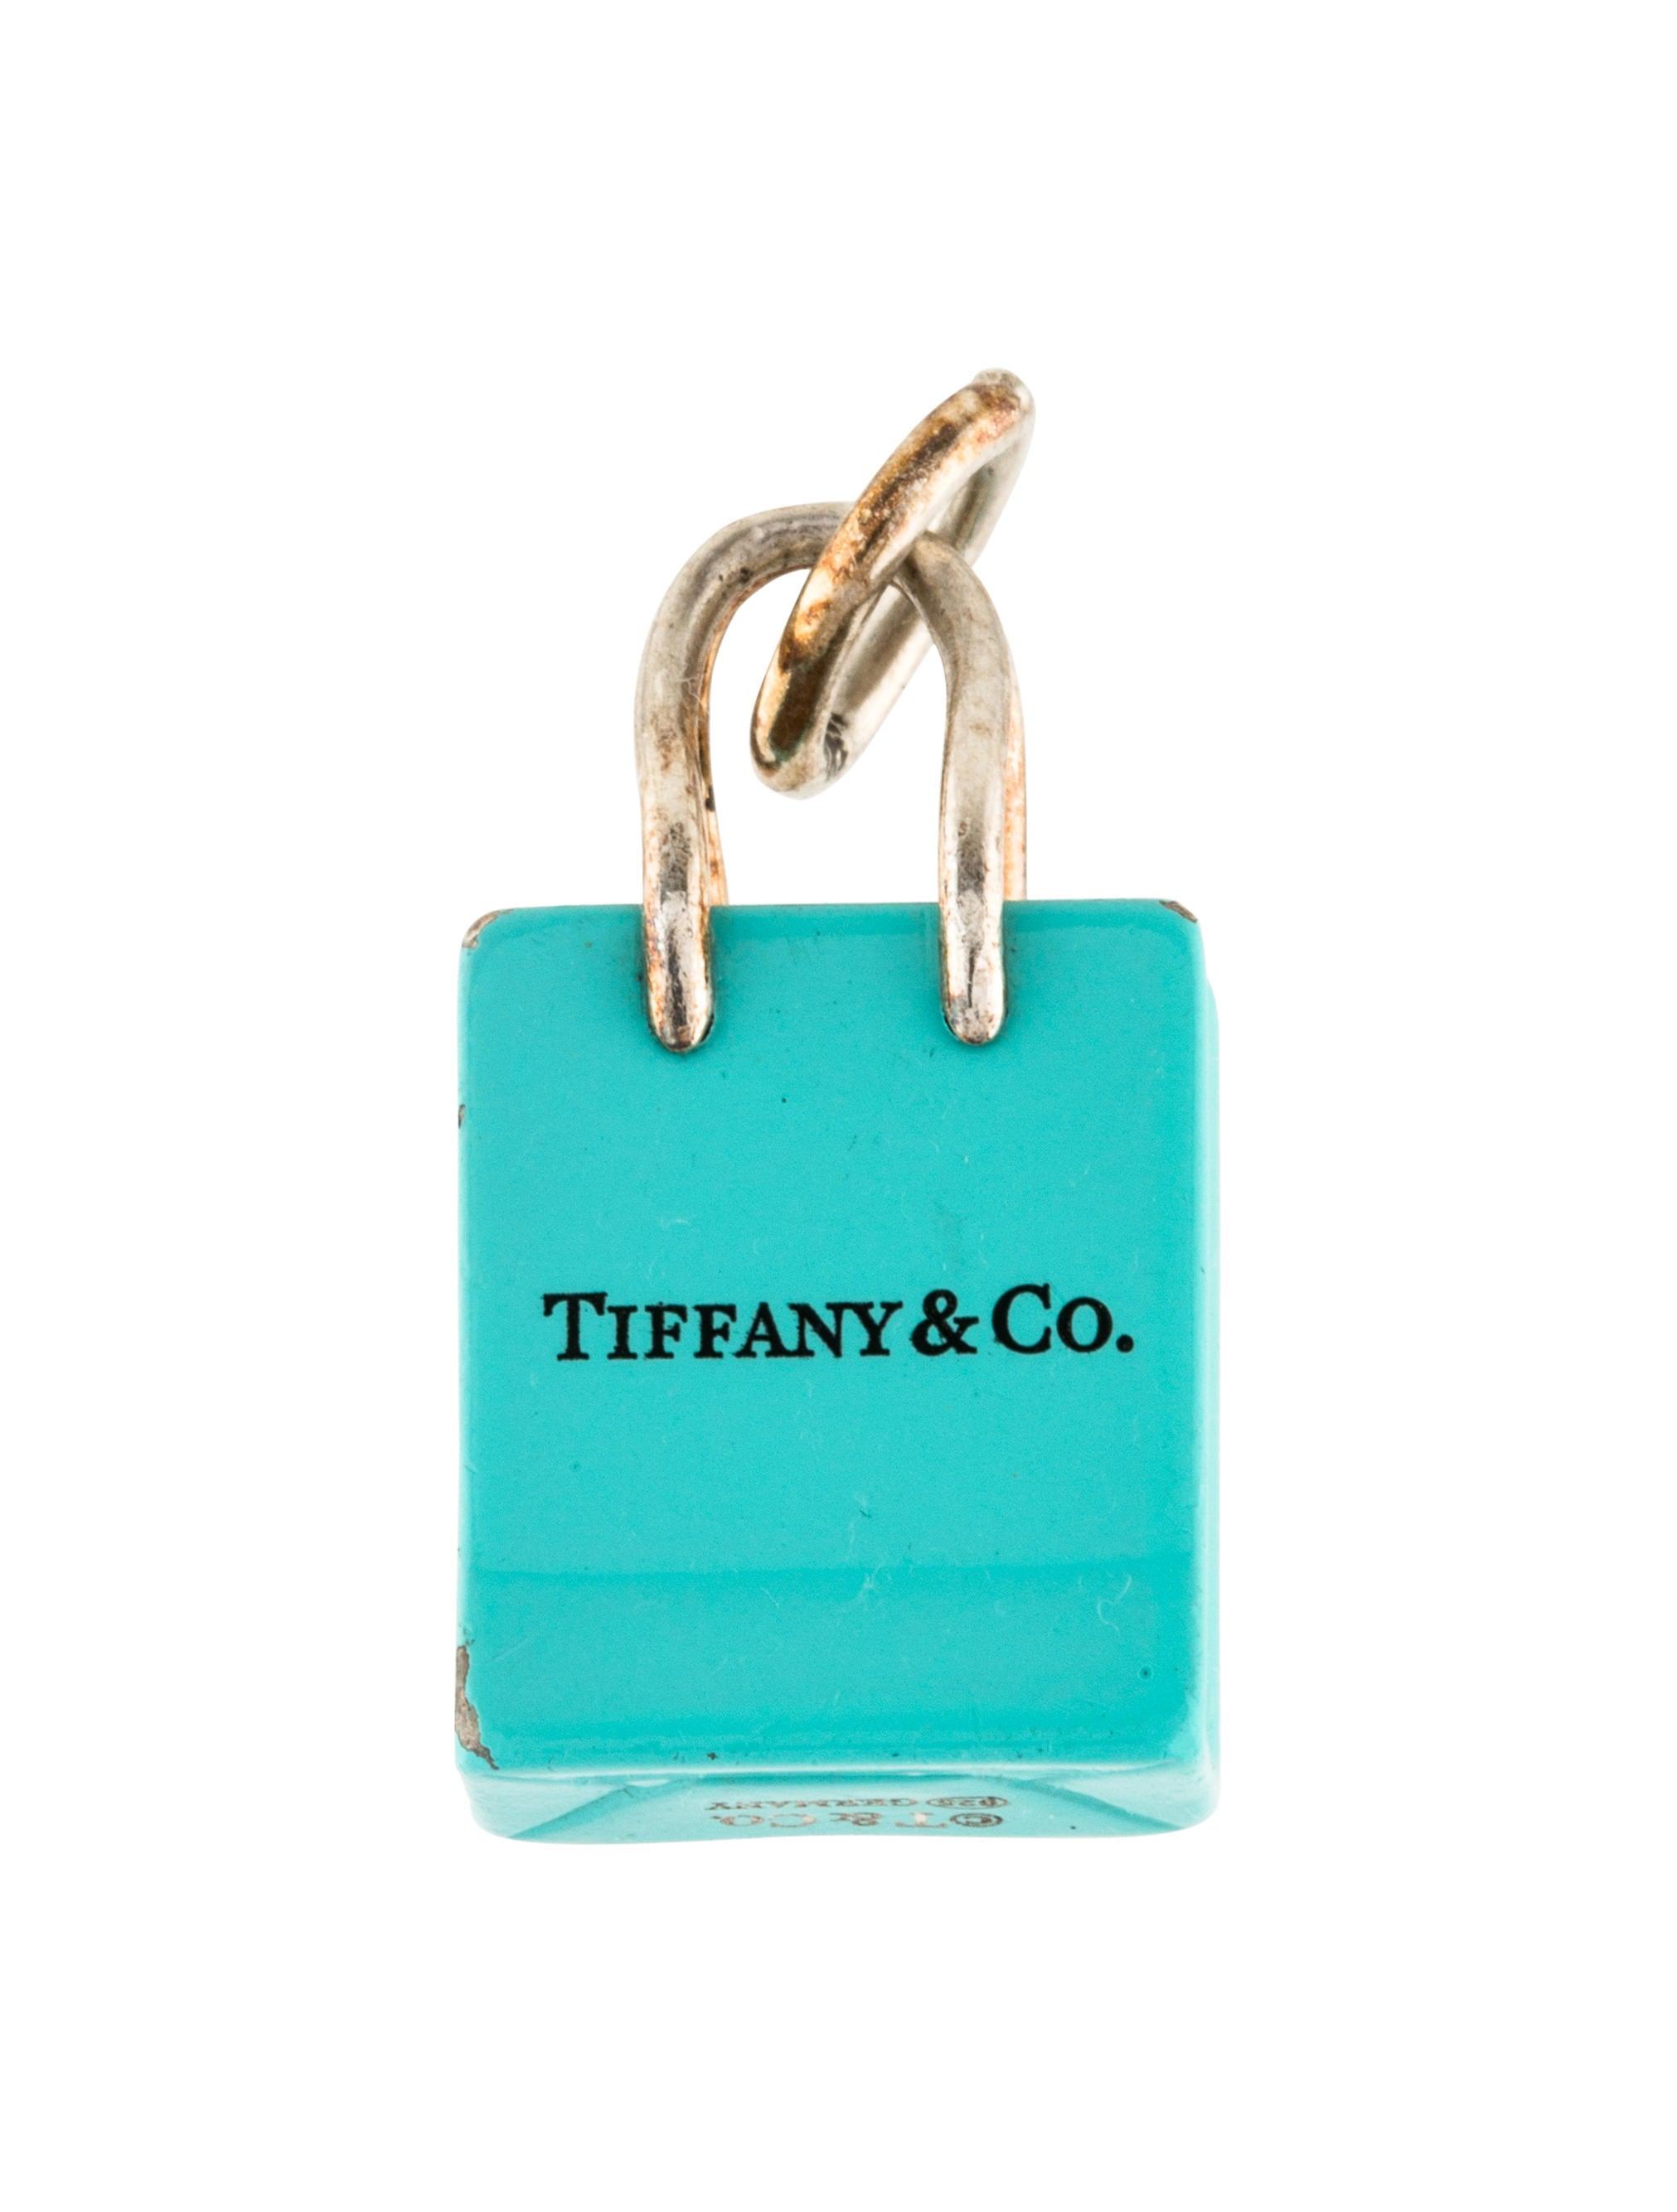 56d754f695 Tiffany & Co. Shopping Bag Charm - Charms - TIF66921 | The RealReal